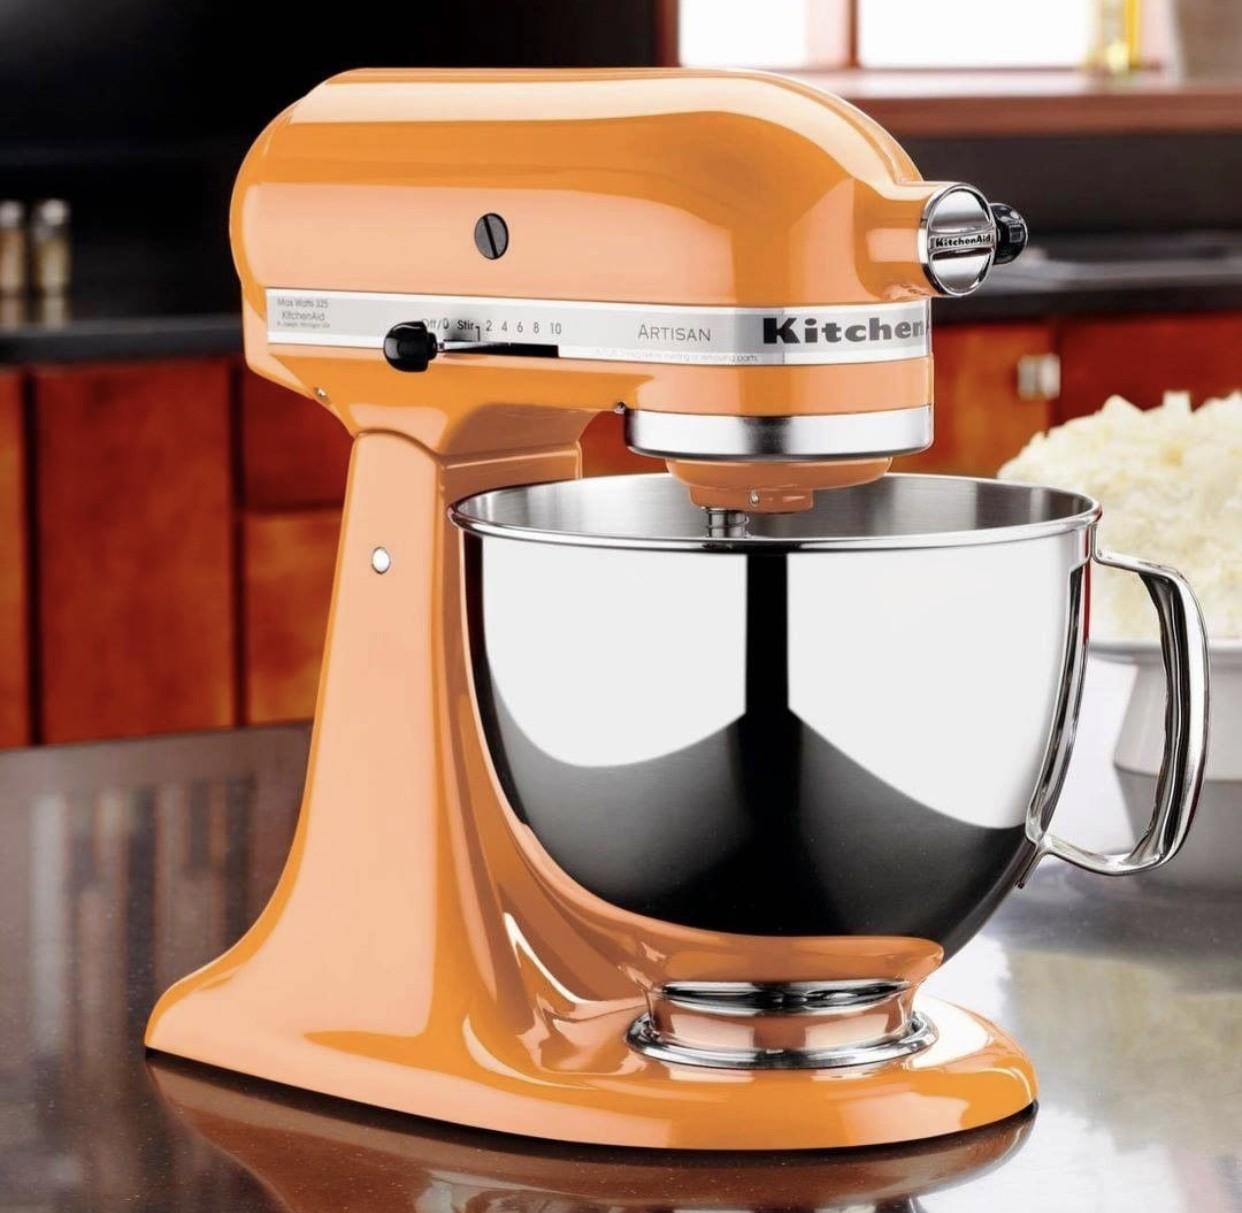 Batedeira Stand Mixer Artisan Tangerine KitchenAid - KEA33C8 - 127V